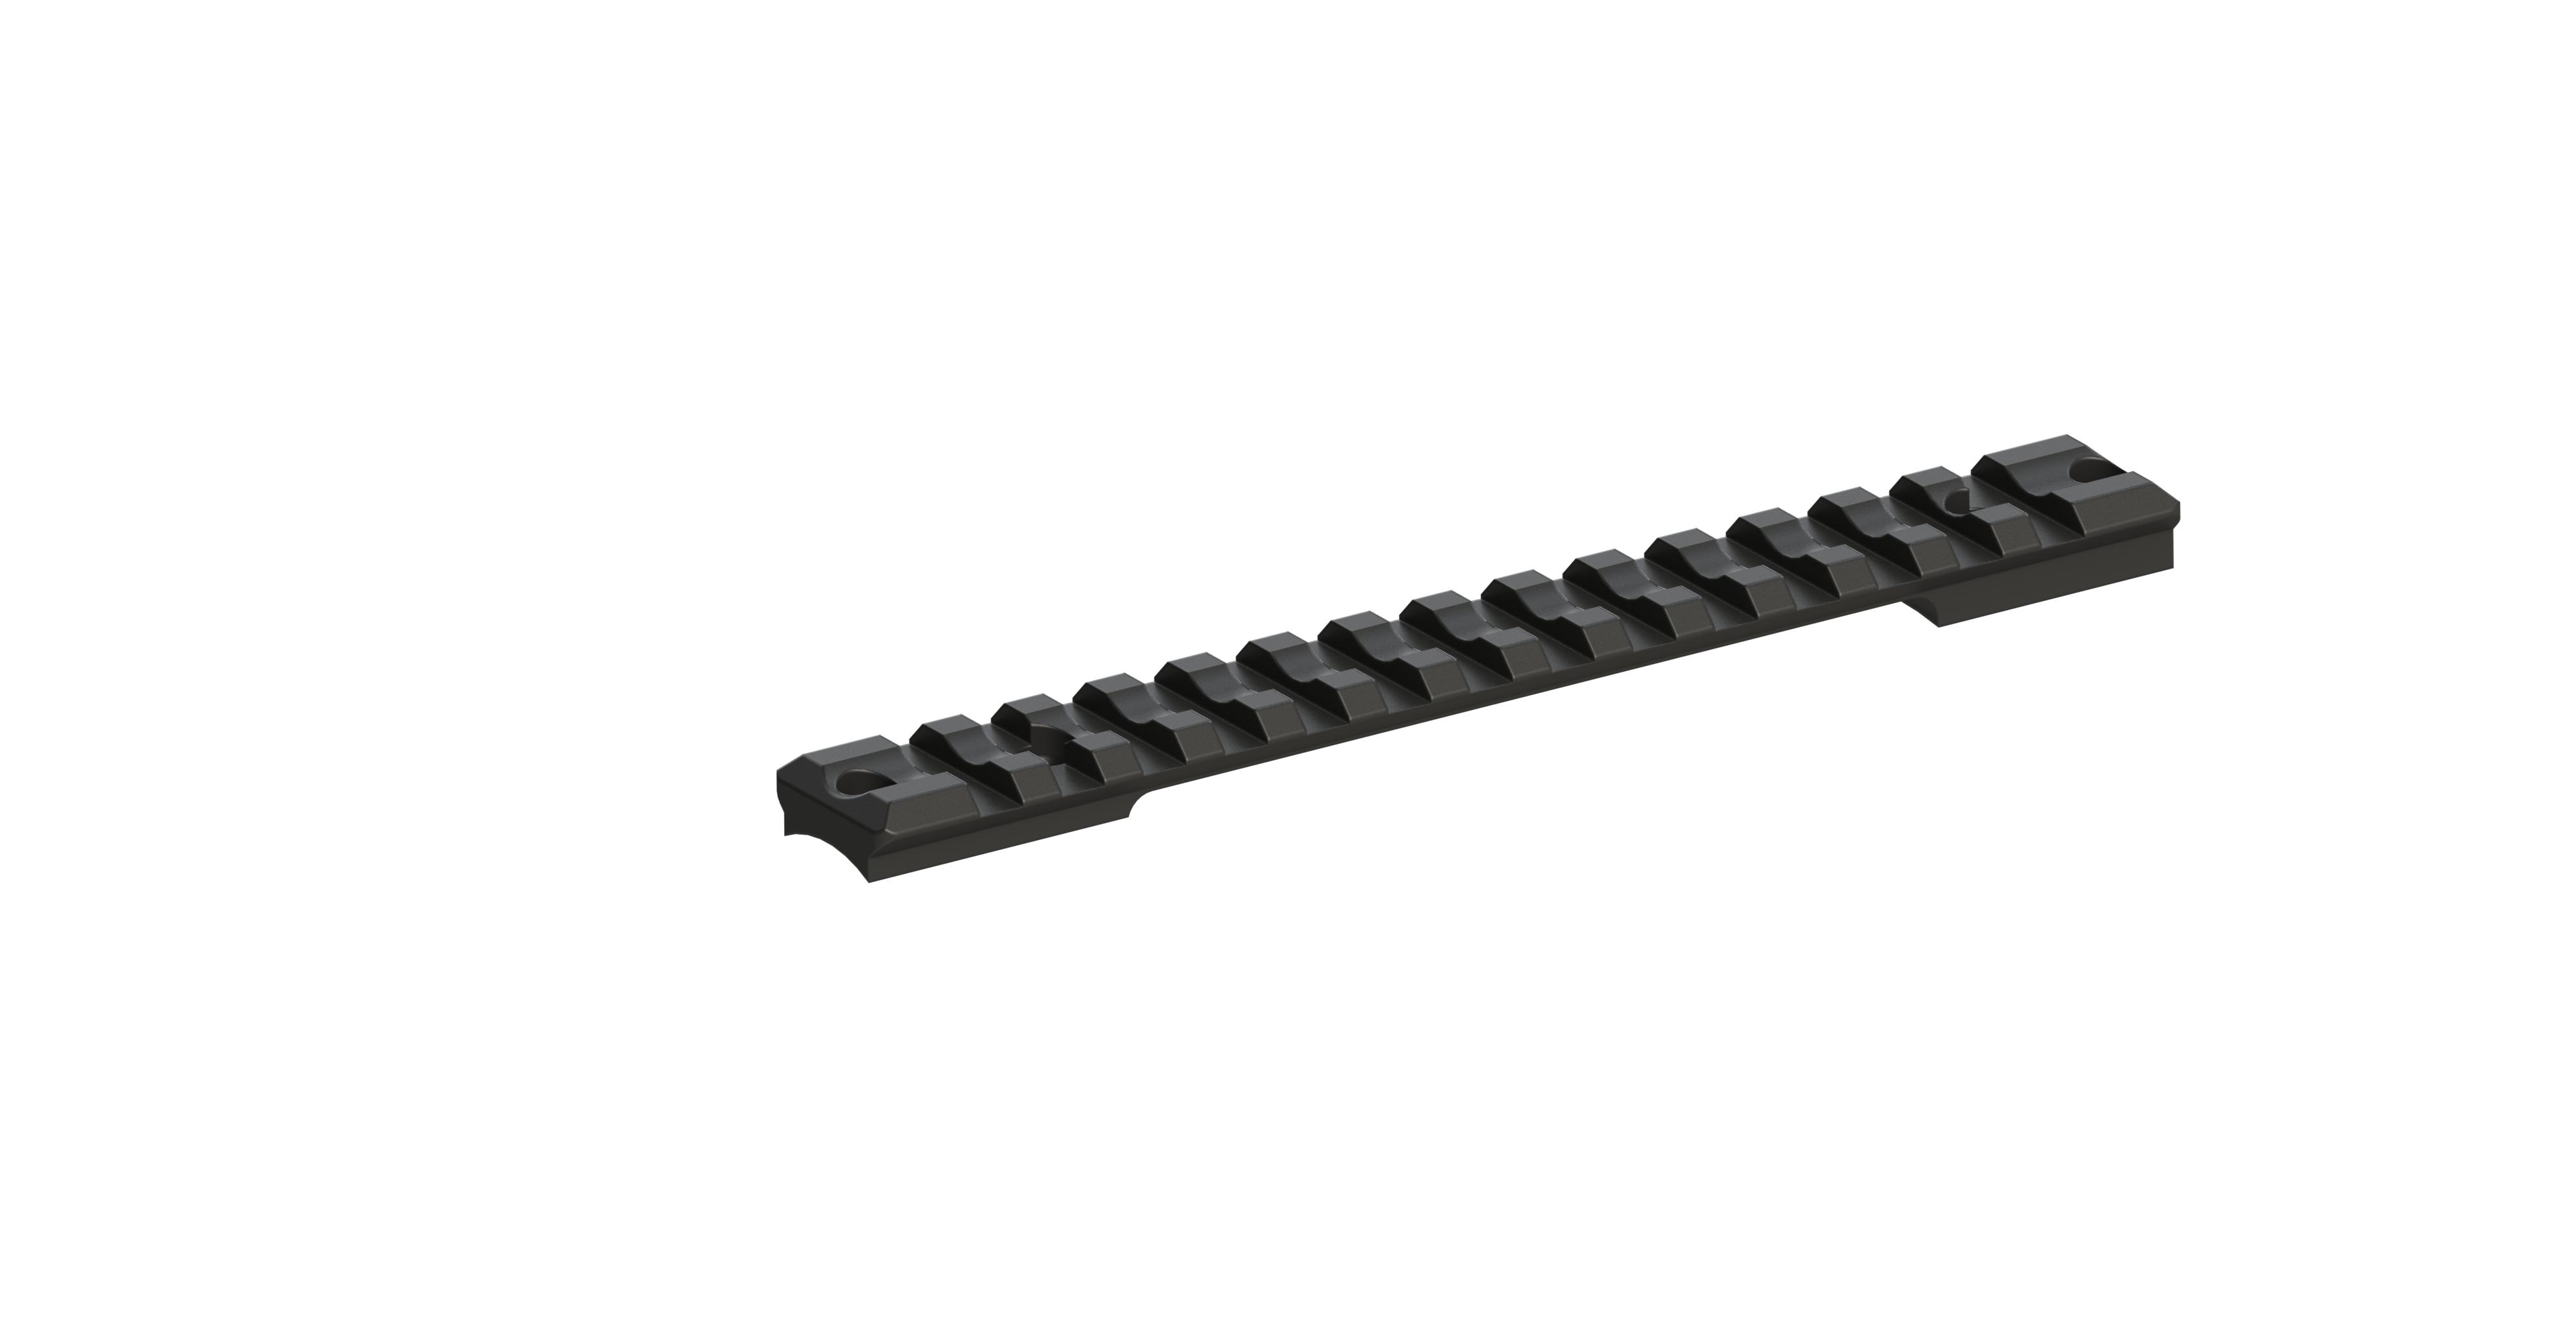 Recknagel Picatinny Schiene CZ - 550 Magnum